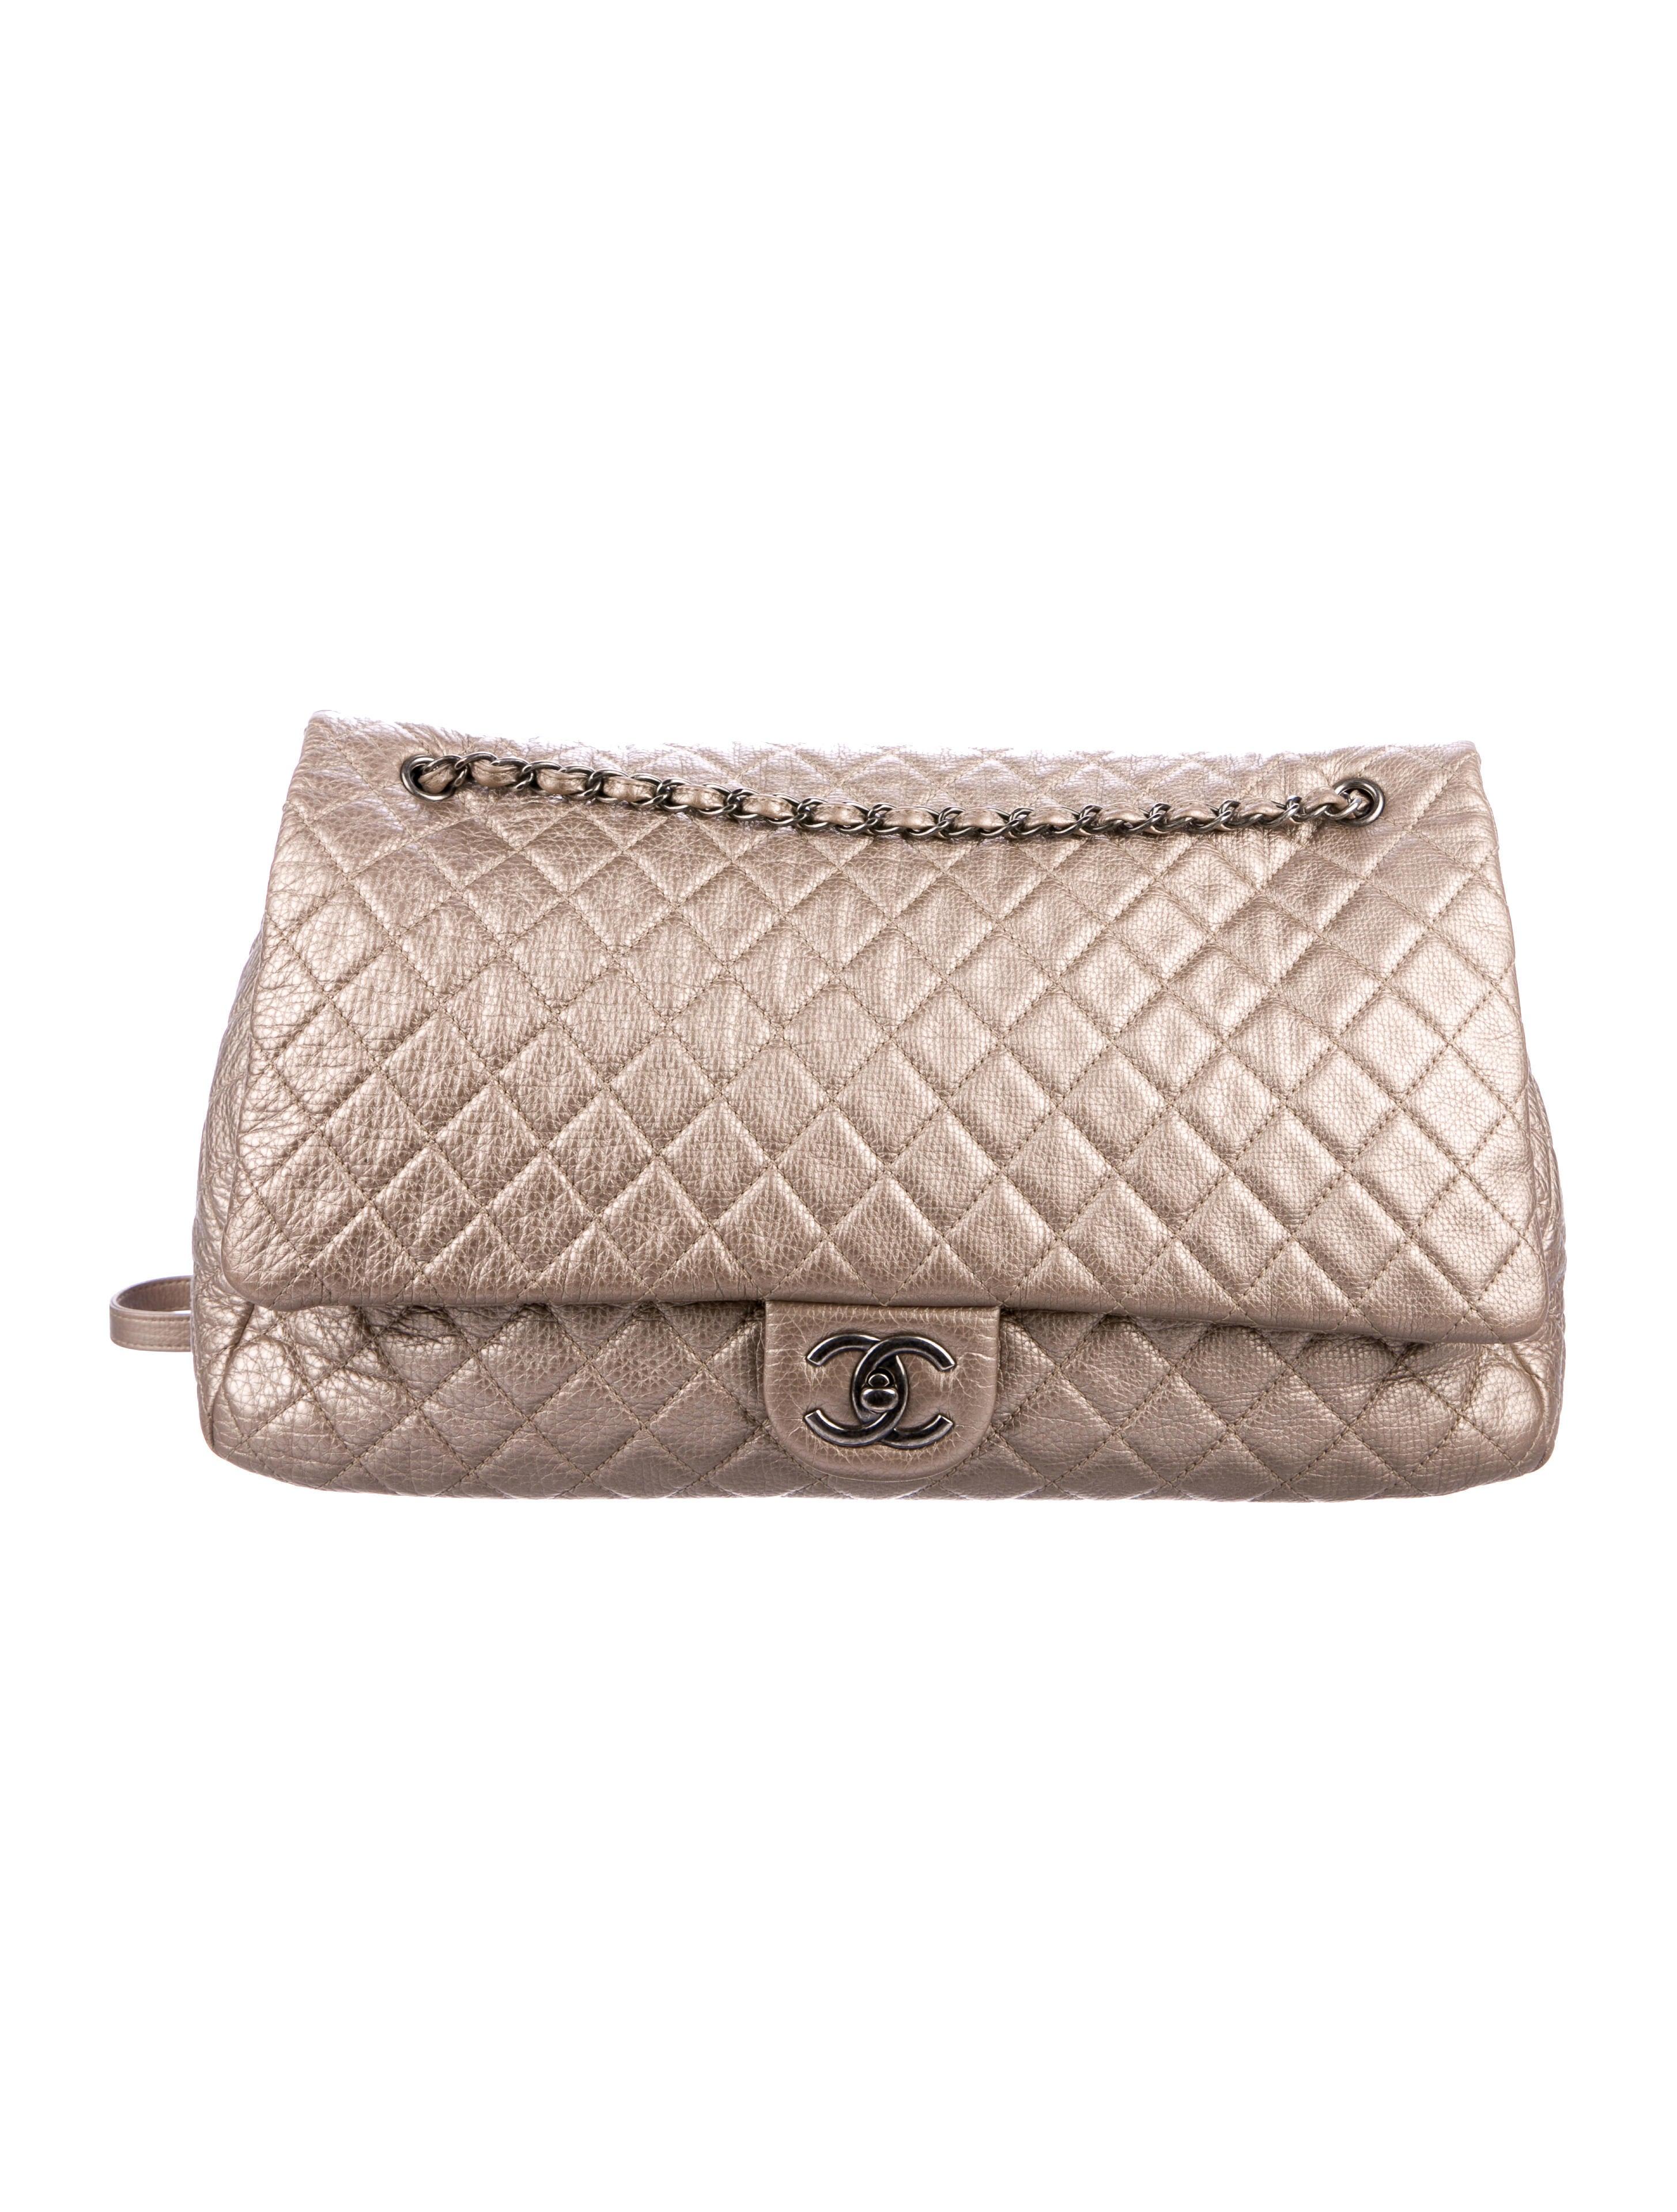 62720bee5fac21 Chanel XXL Airline Classic Flap Bag - Handbags - CHA236983 | The ...